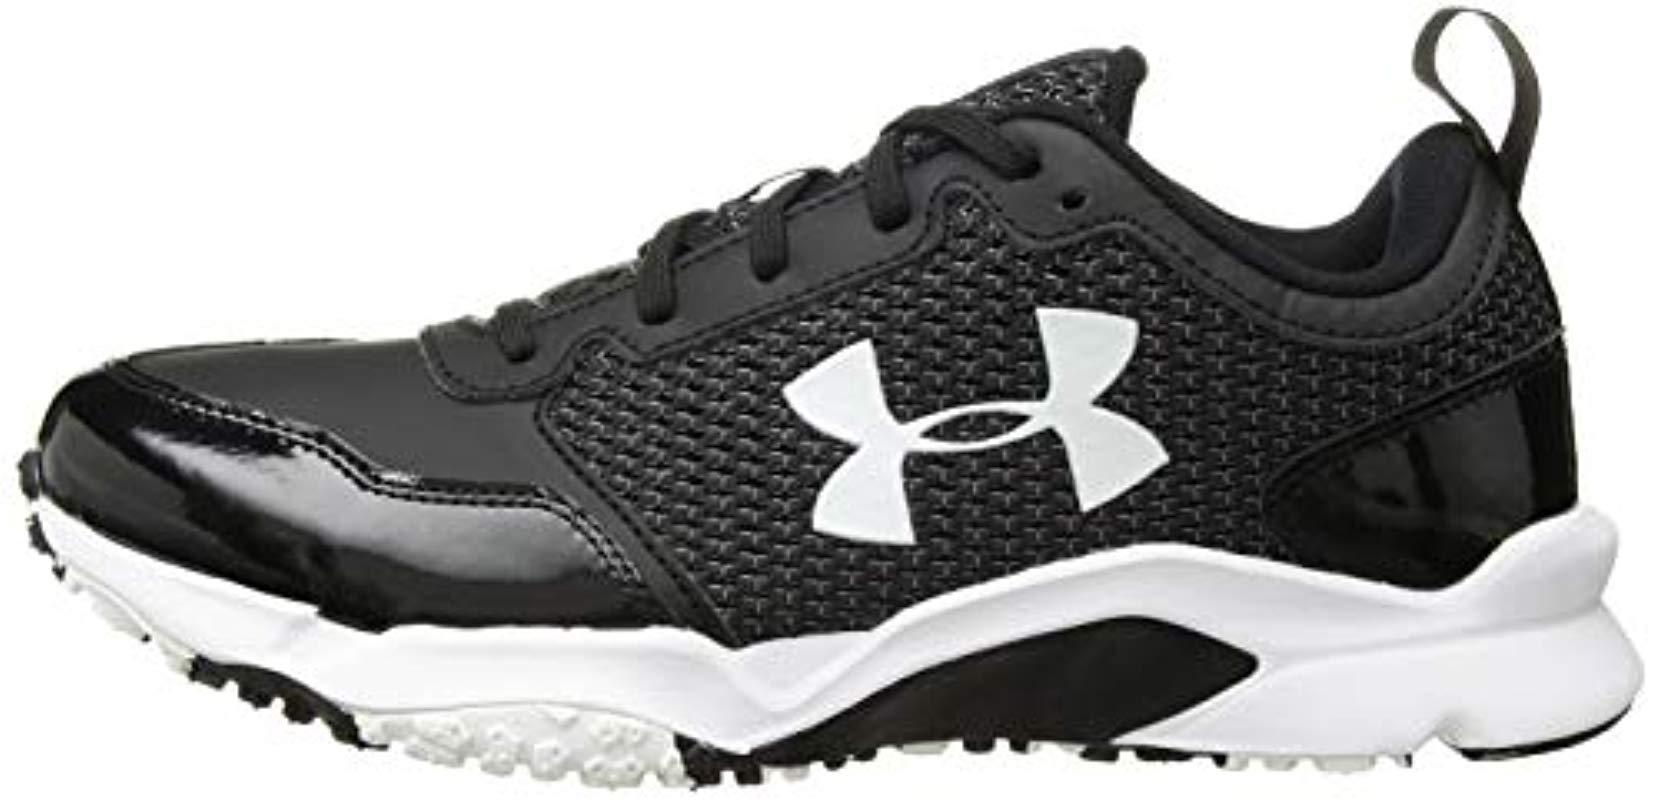 Ultimate Turf Trainer Baseball Shoe